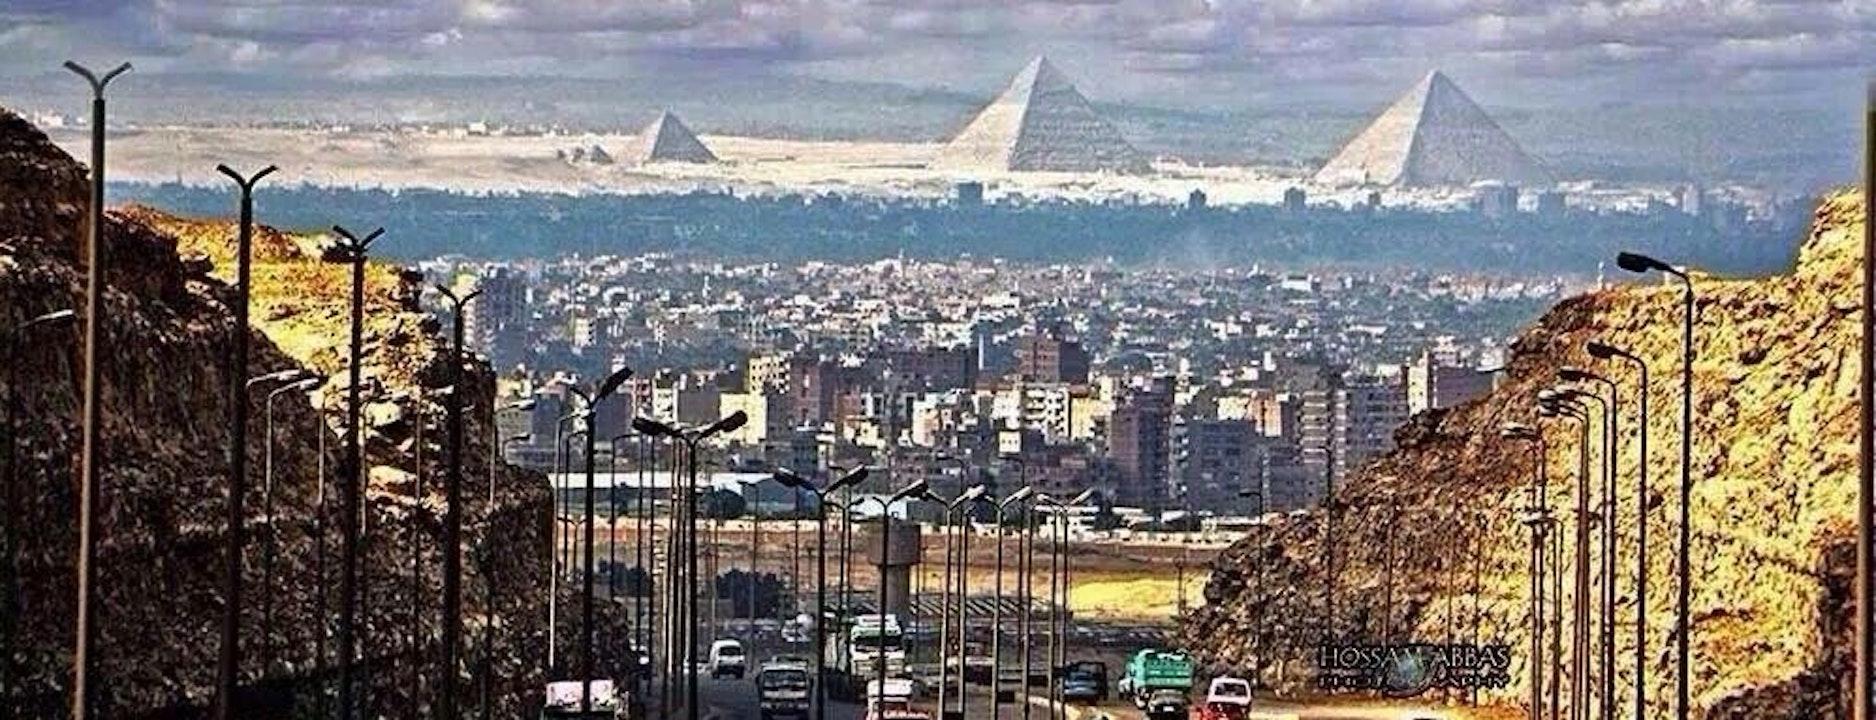 8 Days  Cairo (4) and Hurghada (3) / Premium Private tour